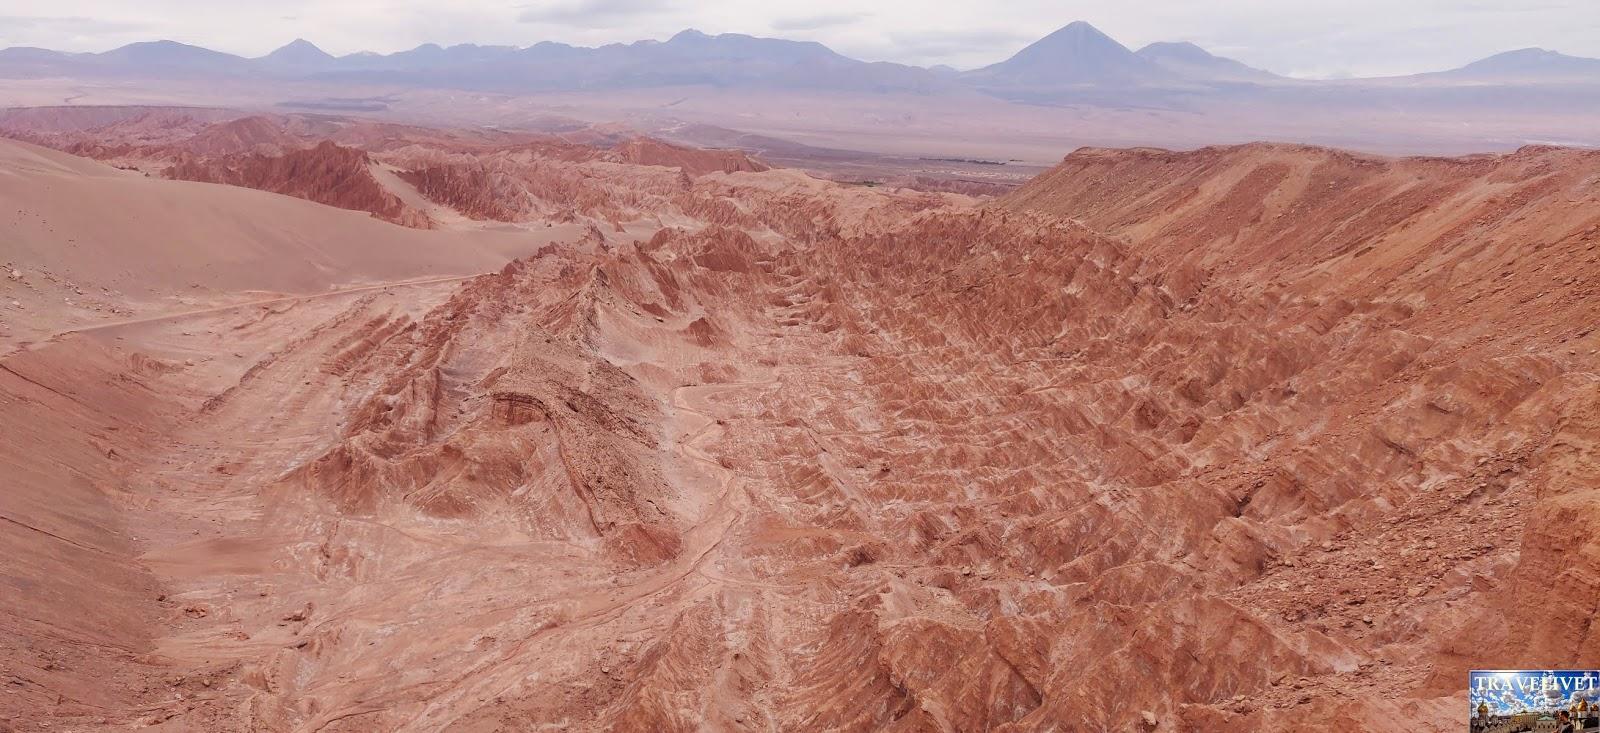 Chili Chile San Pedro de Atacama désert la vallée de la lune